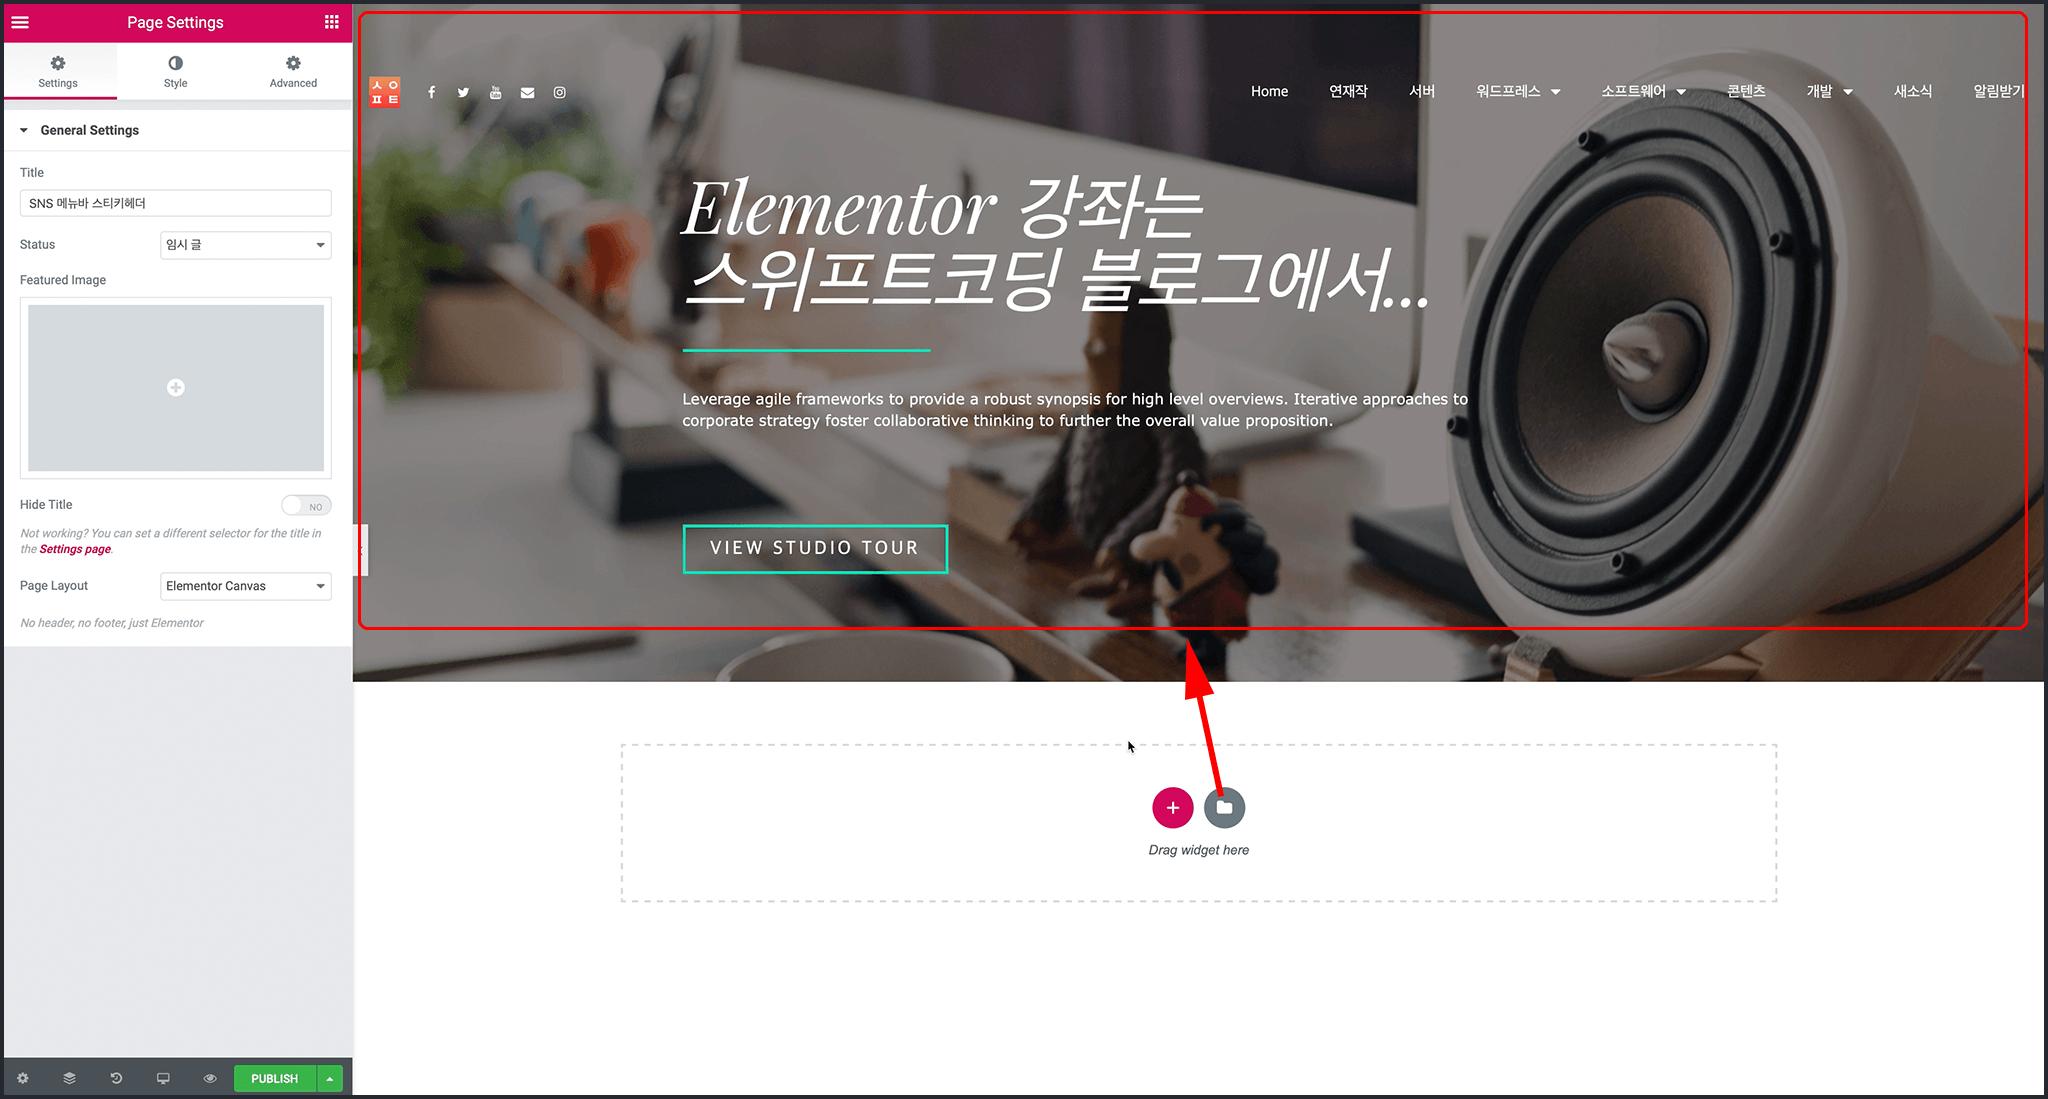 Elementor 첫번째 섹션에 배너가 들어간 사이트헤더 사용자 템플릿을 불러온 모습